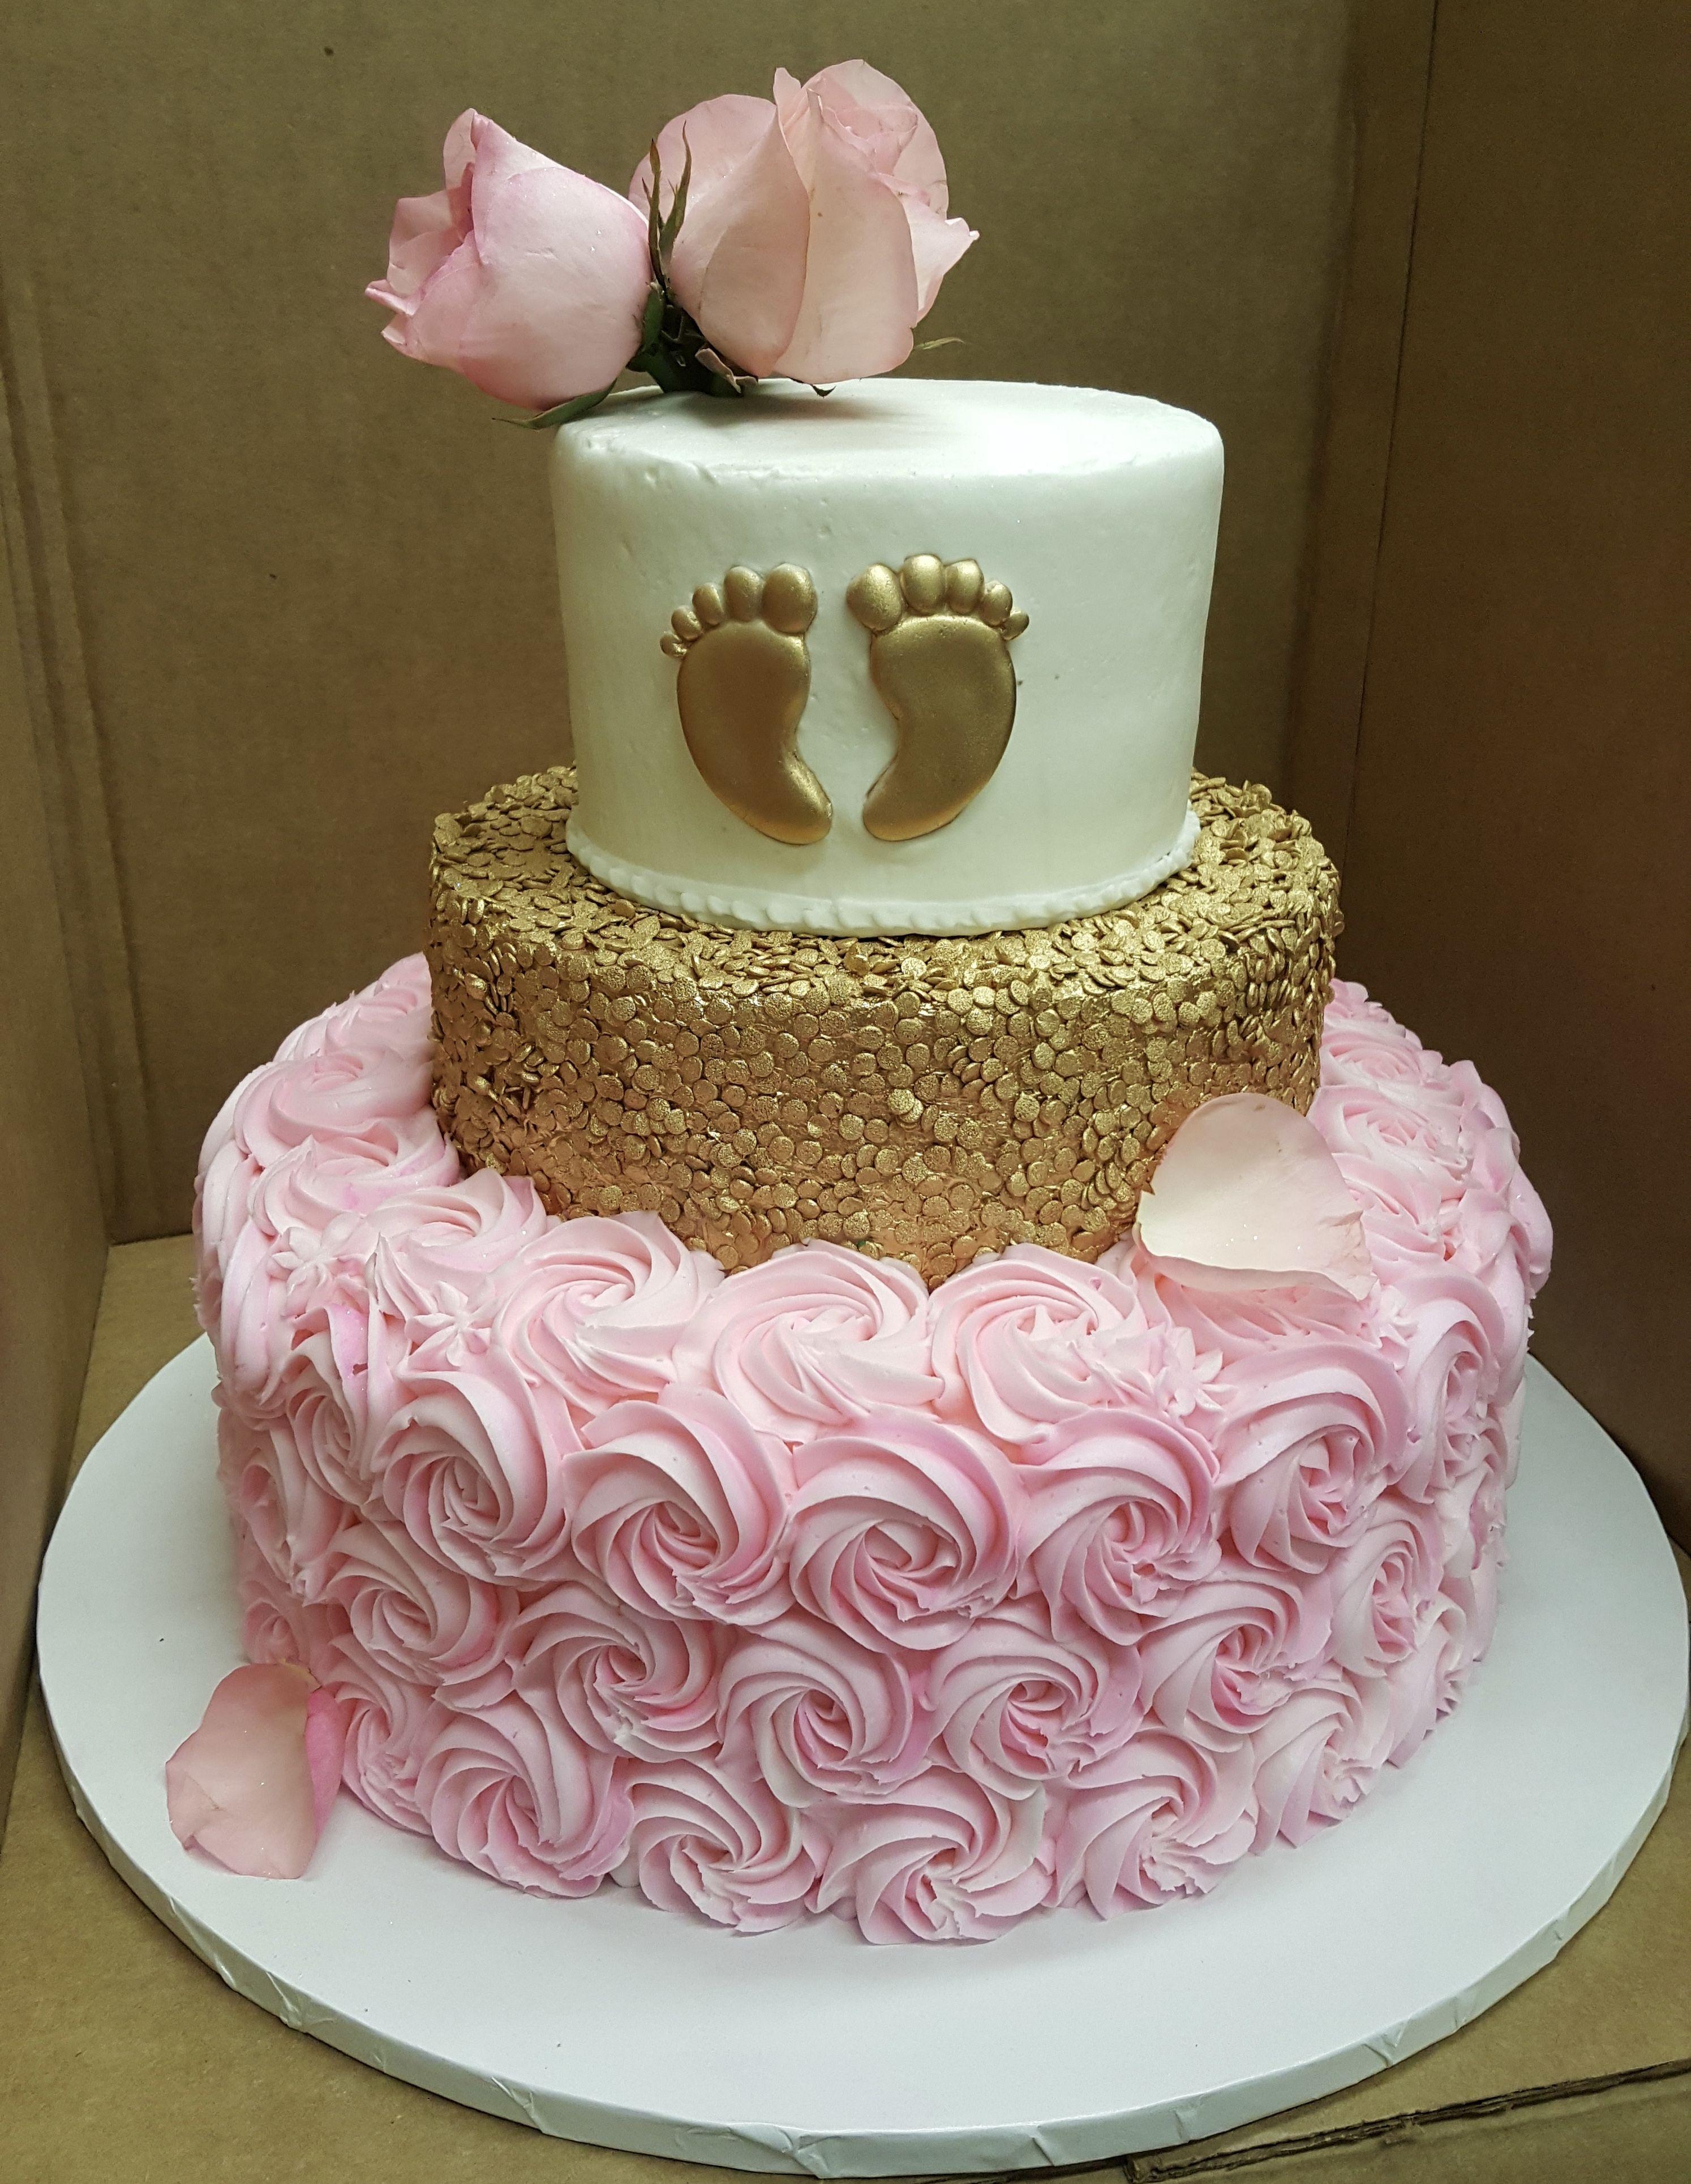 Calumet Bakery Three Tier Baby Feet Gold Rosettes